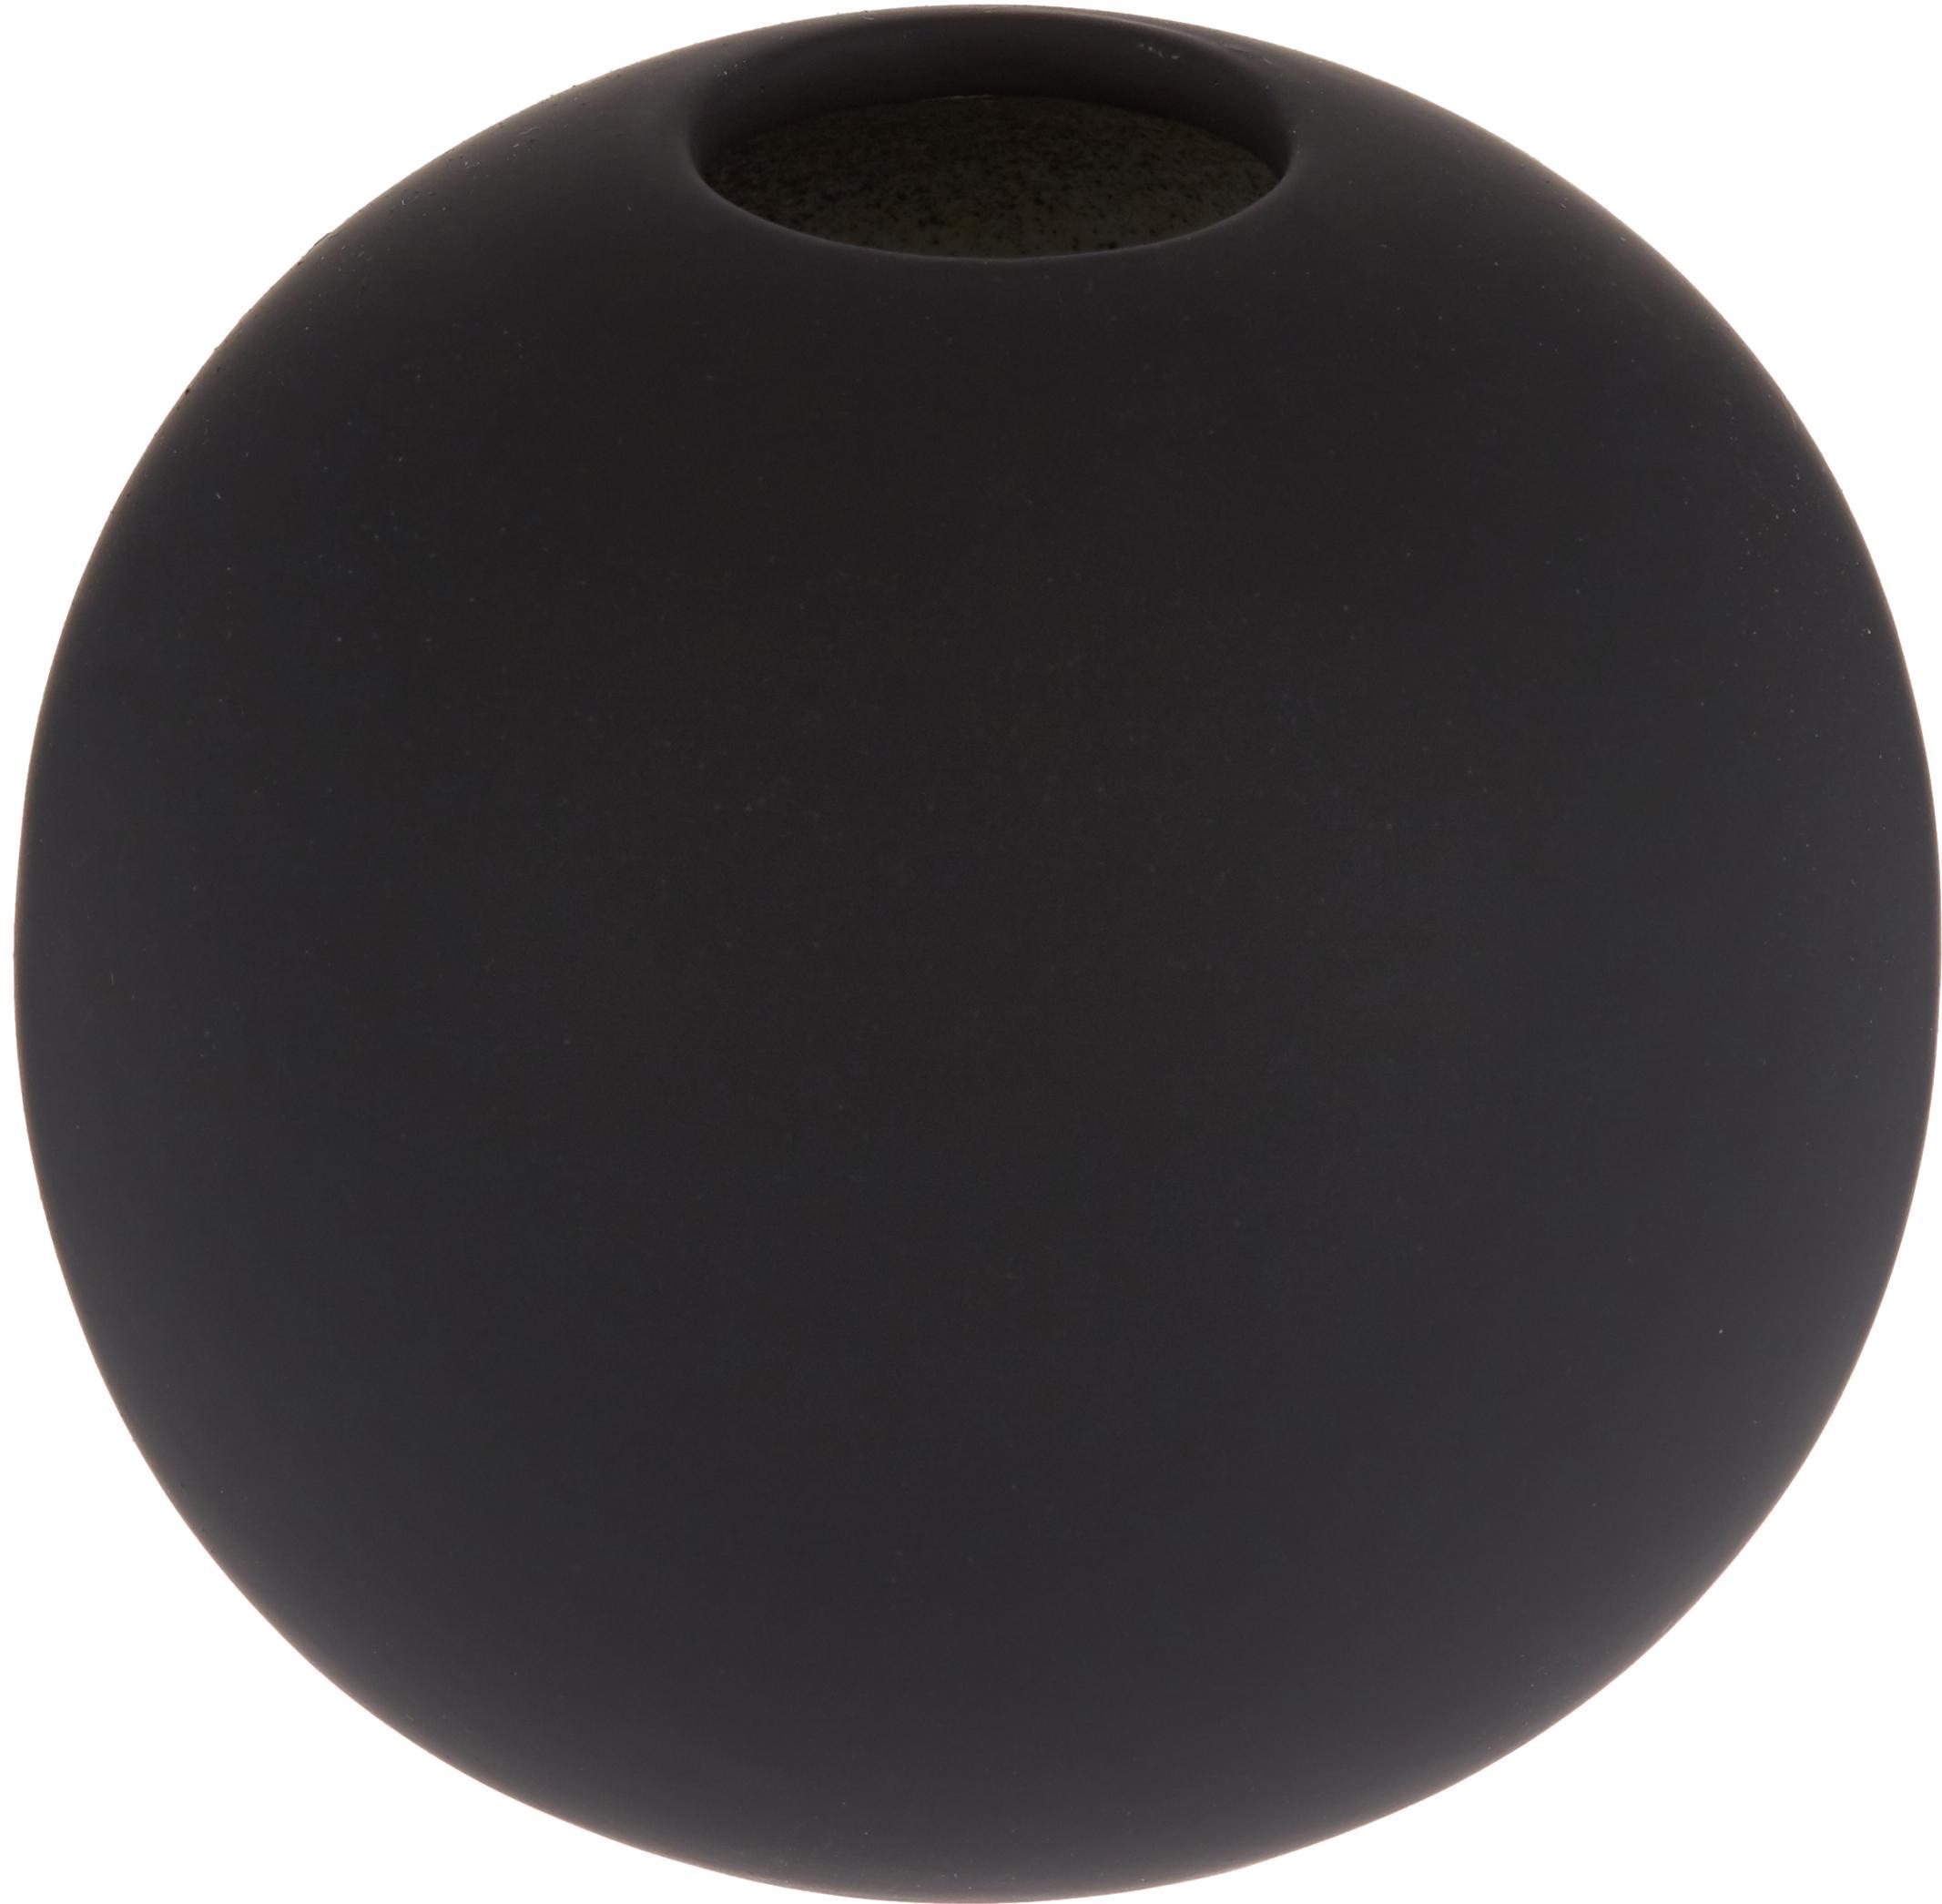 Handgemaakte bolvormige vaas Ball, Keramiek, Zwart, Ø 8 x H 8 cm